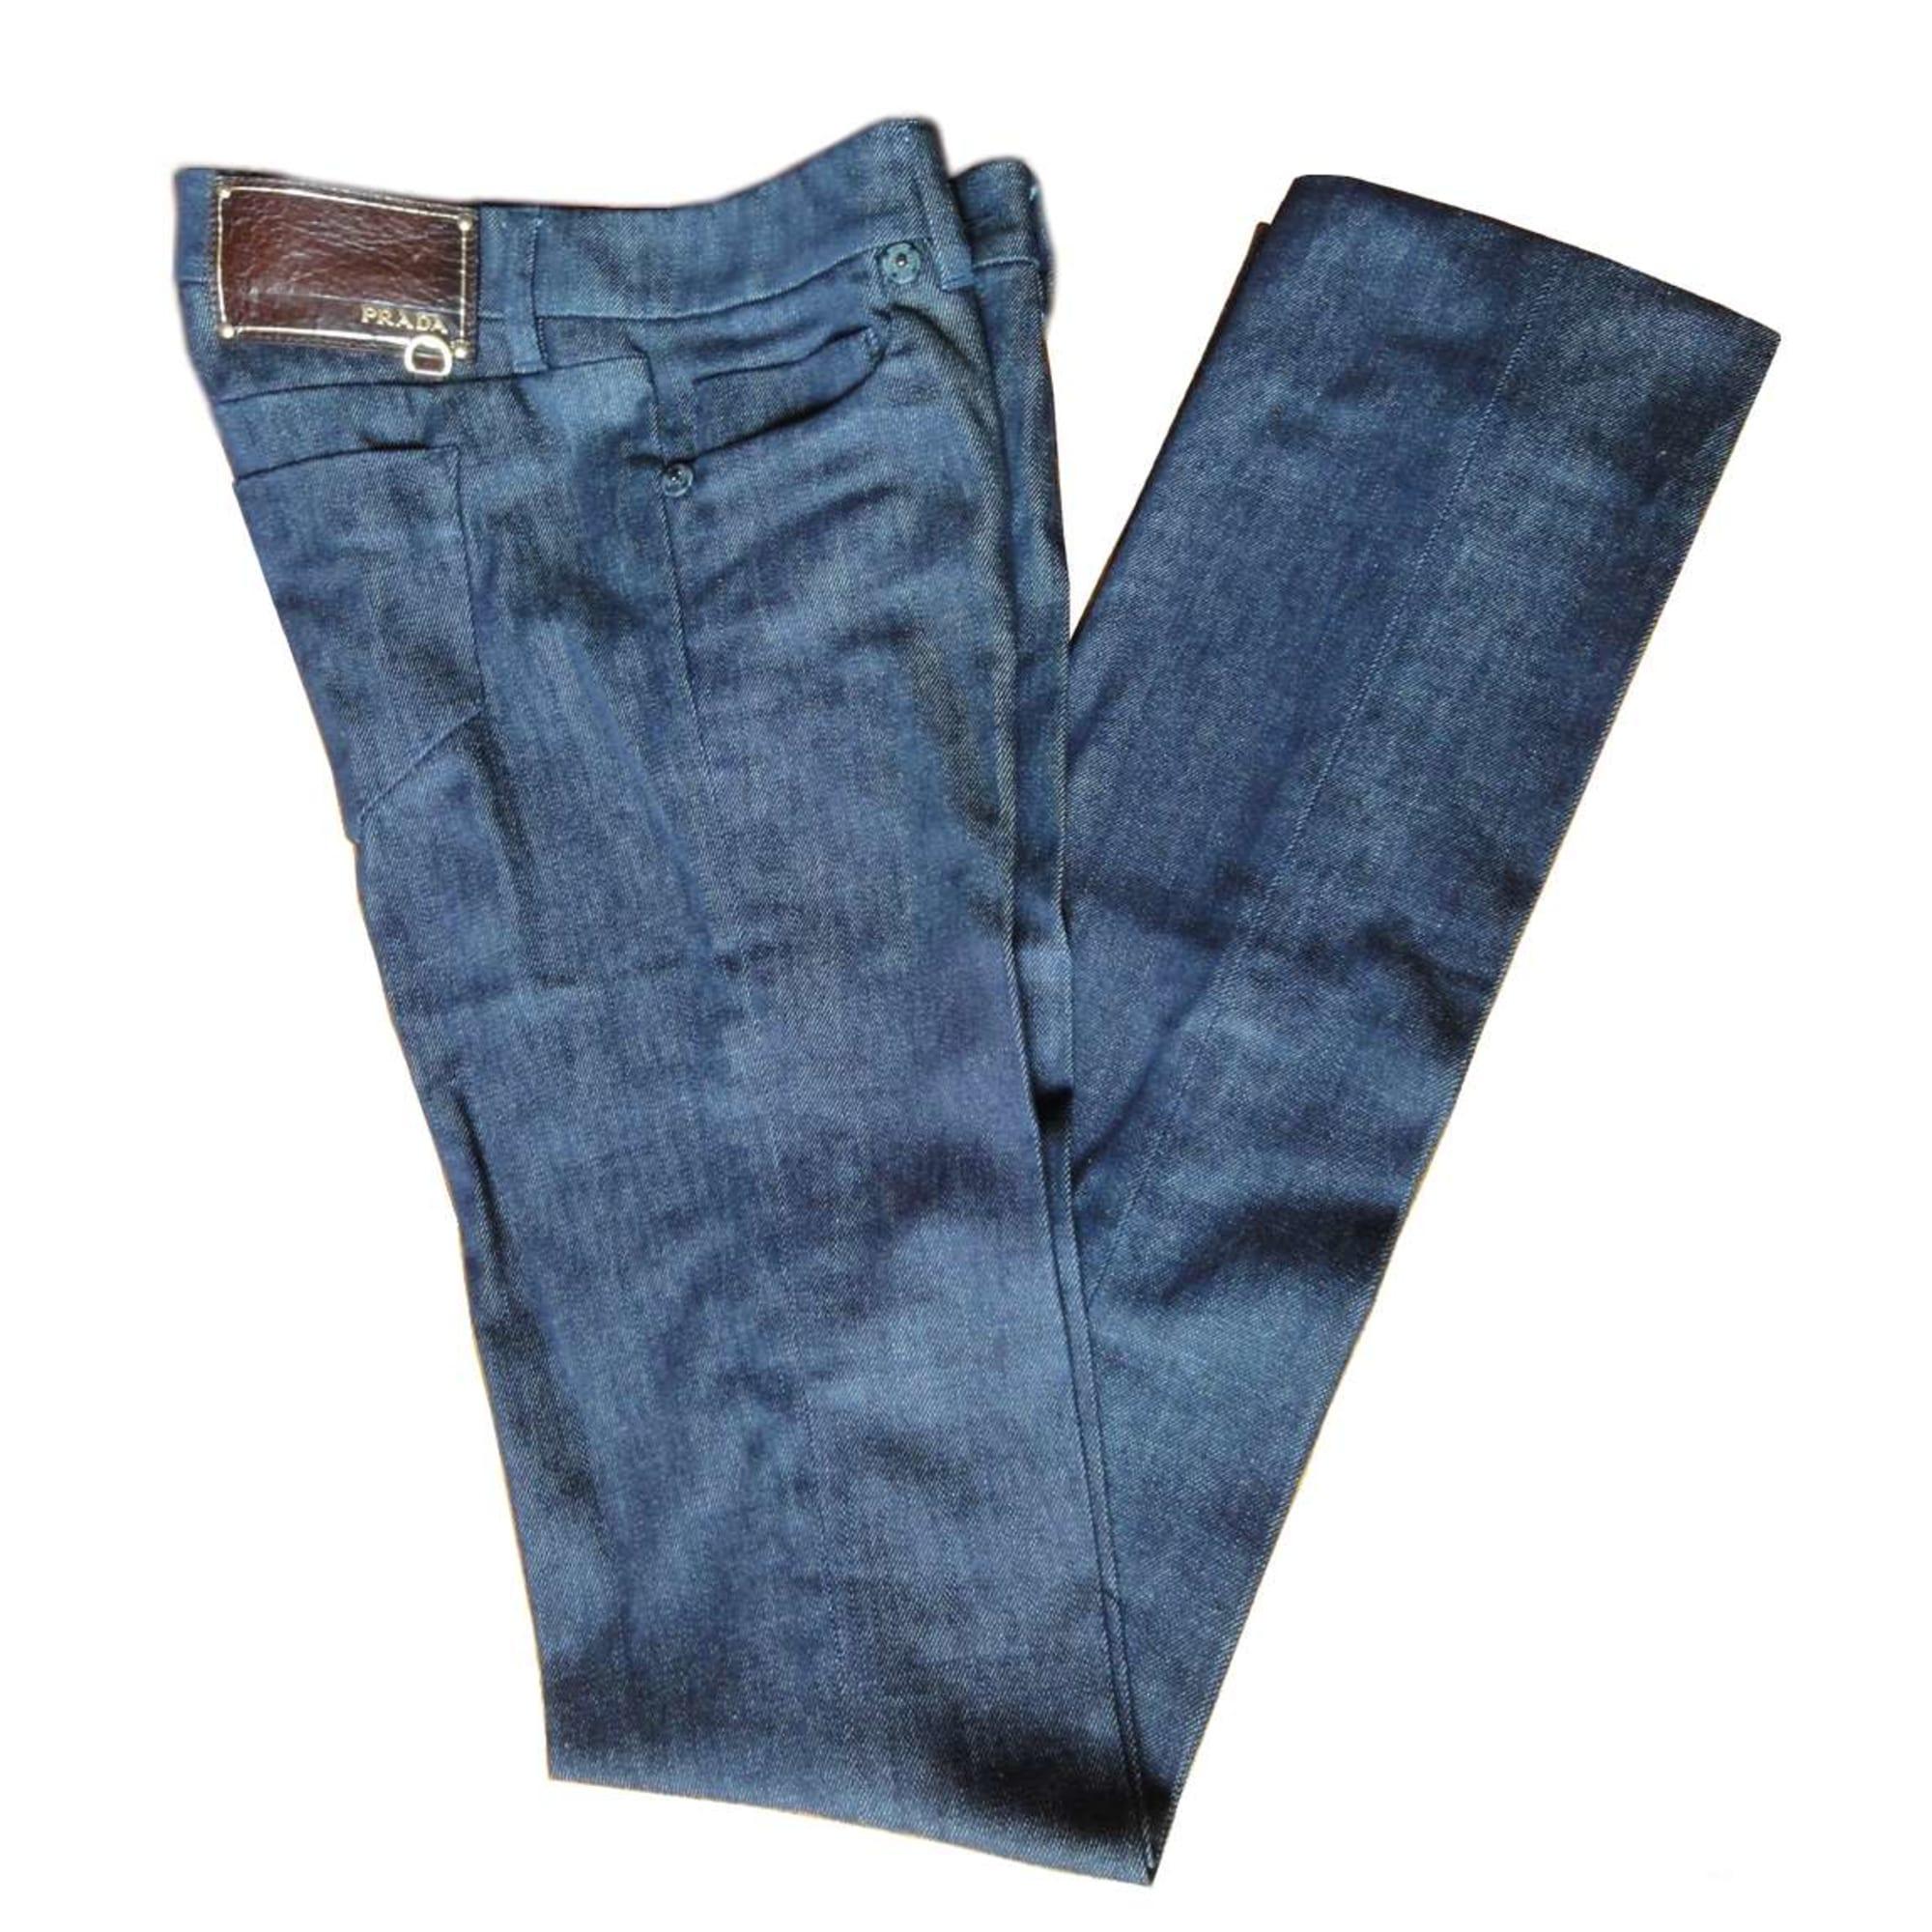 Jeans droit PRADA Bleu, bleu marine, bleu turquoise